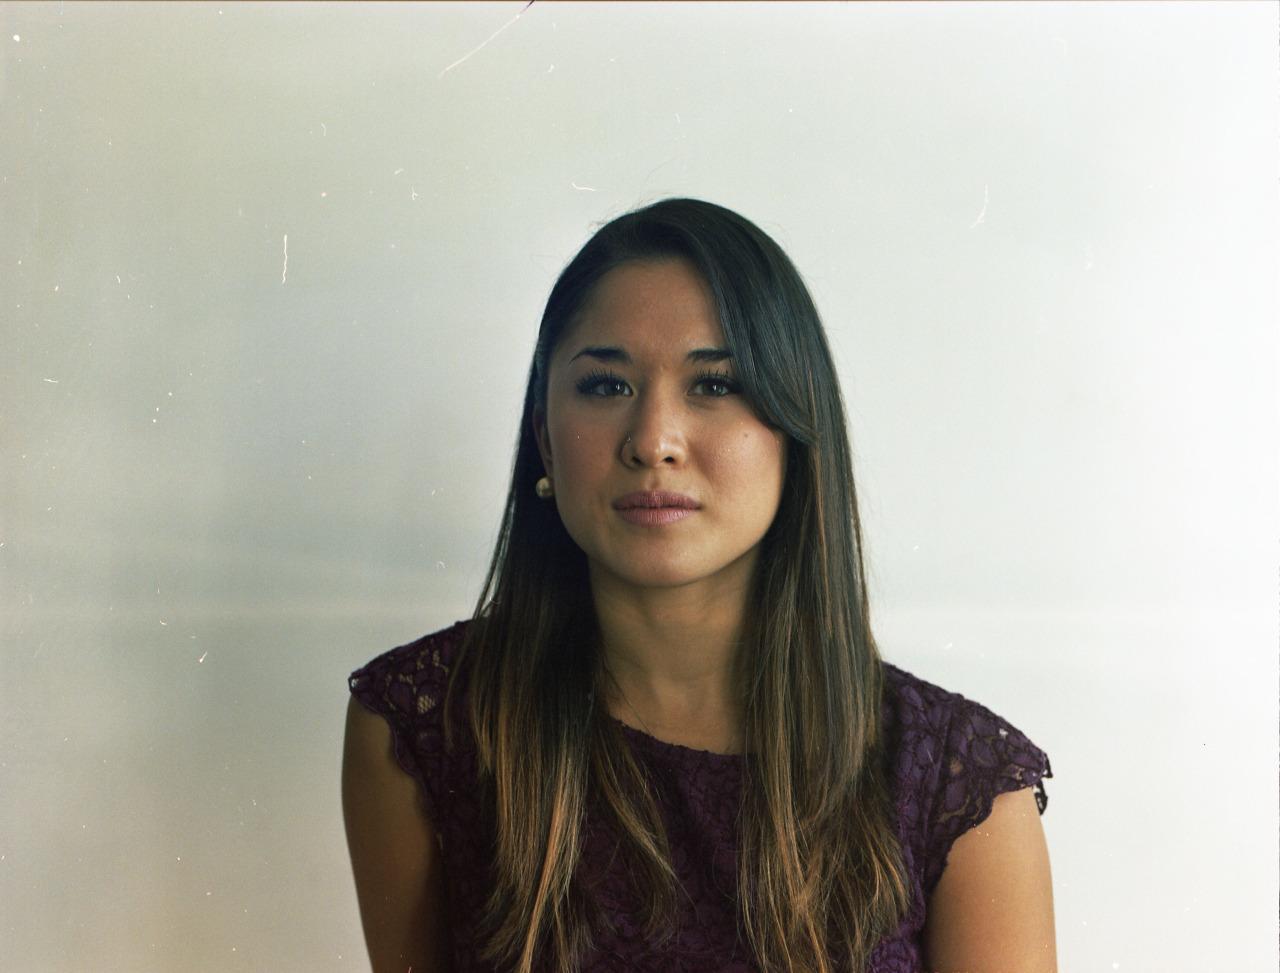 Karina Ikezoe.